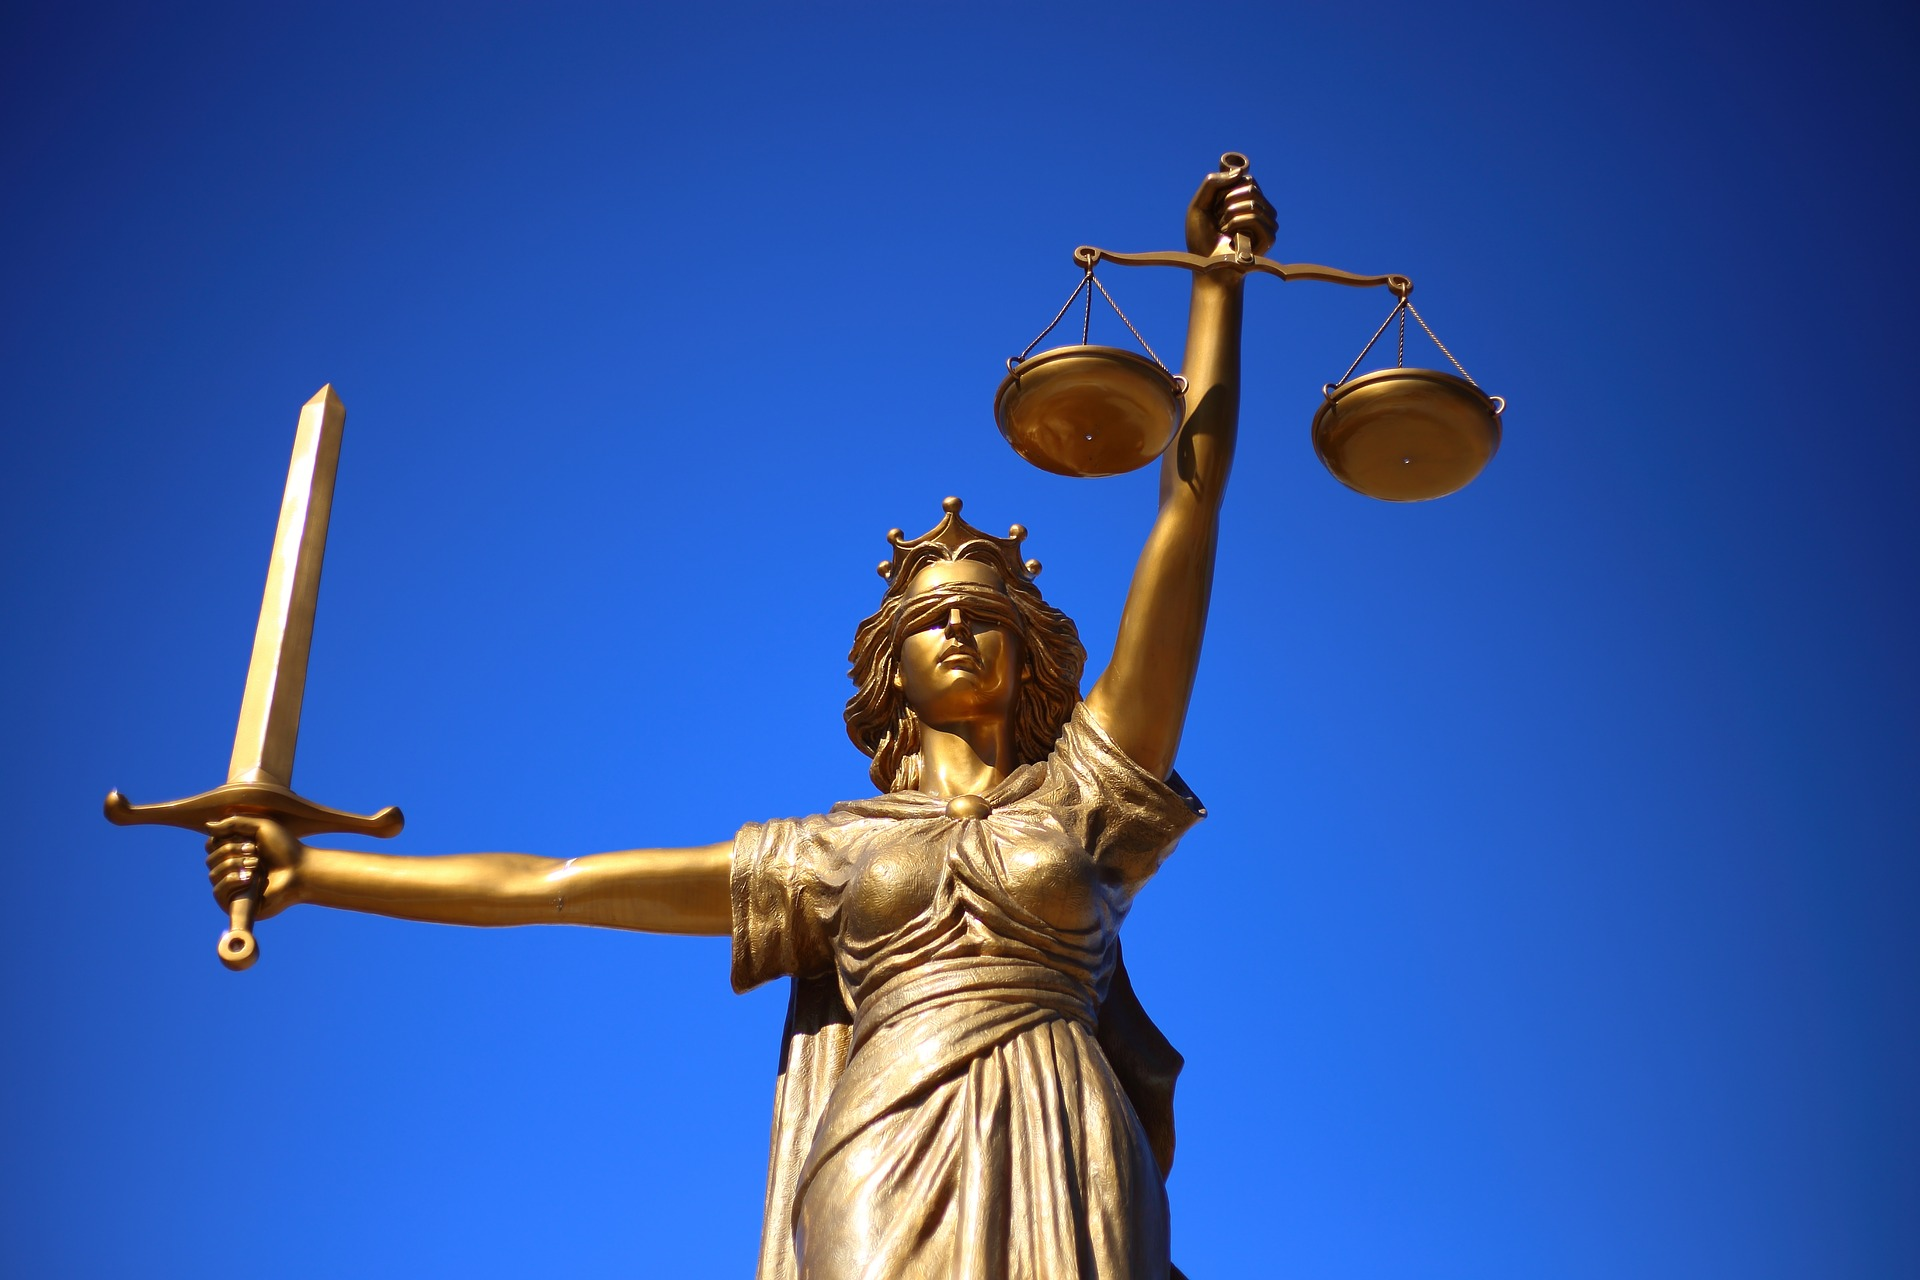 Tag des Grundgesetzes